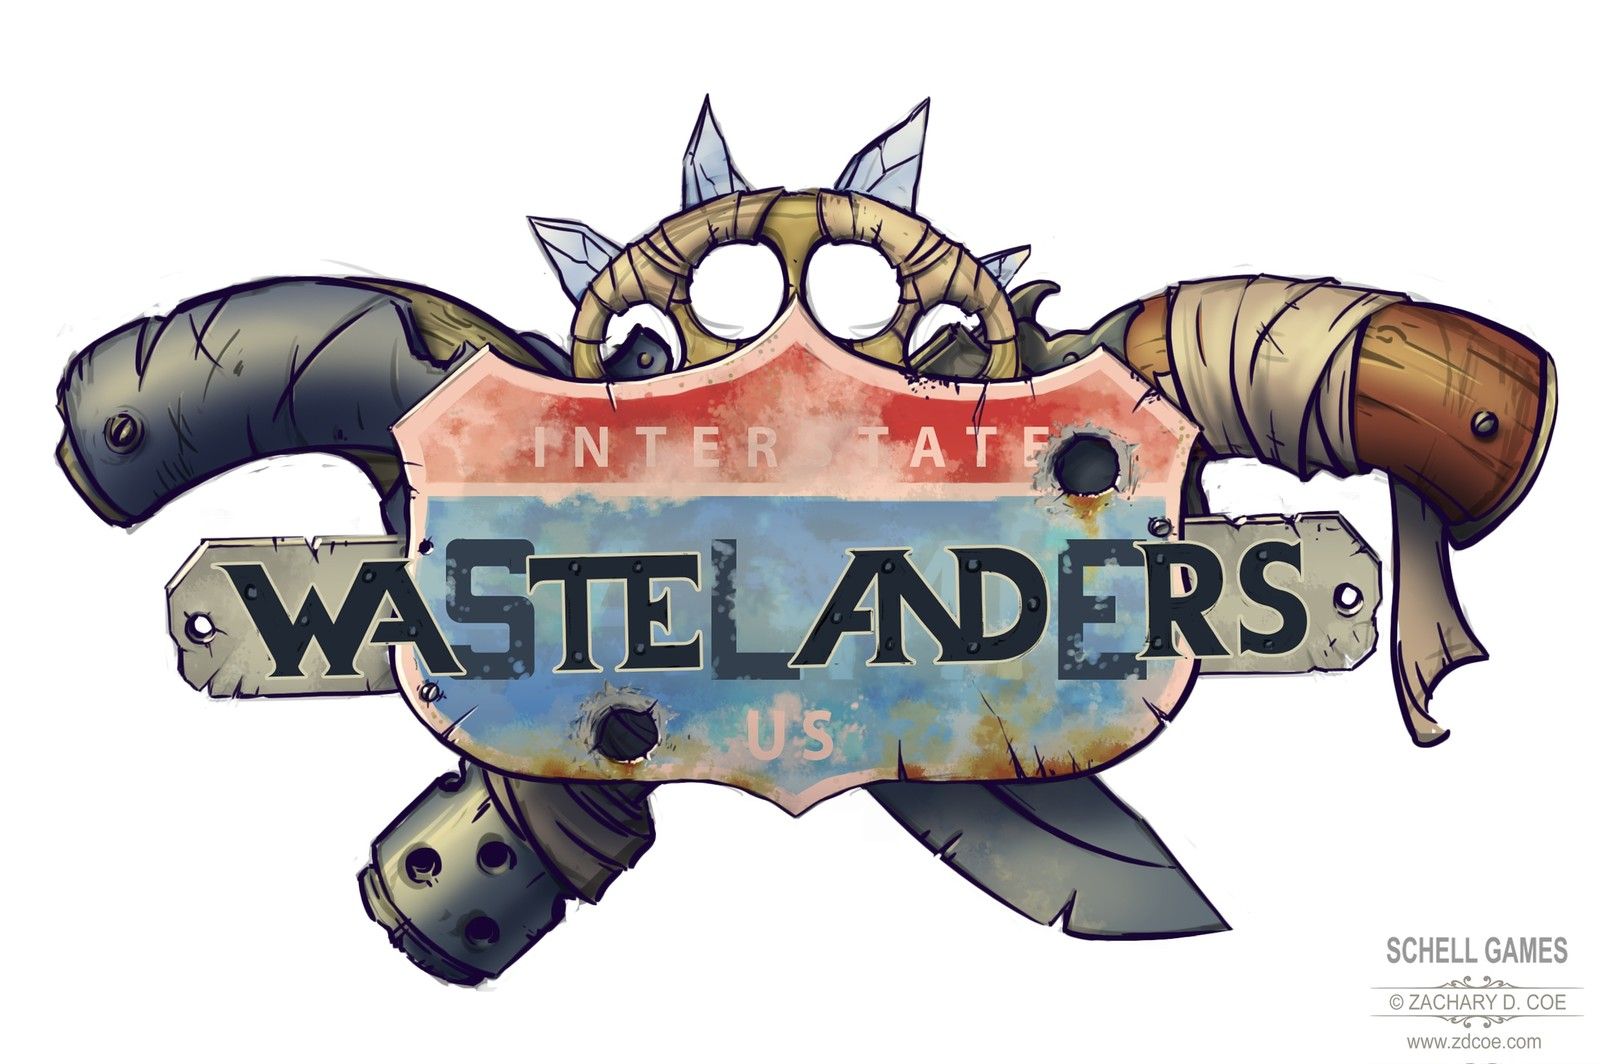 WASTELANDERS LOGO Original Final by Zachary D. Coe